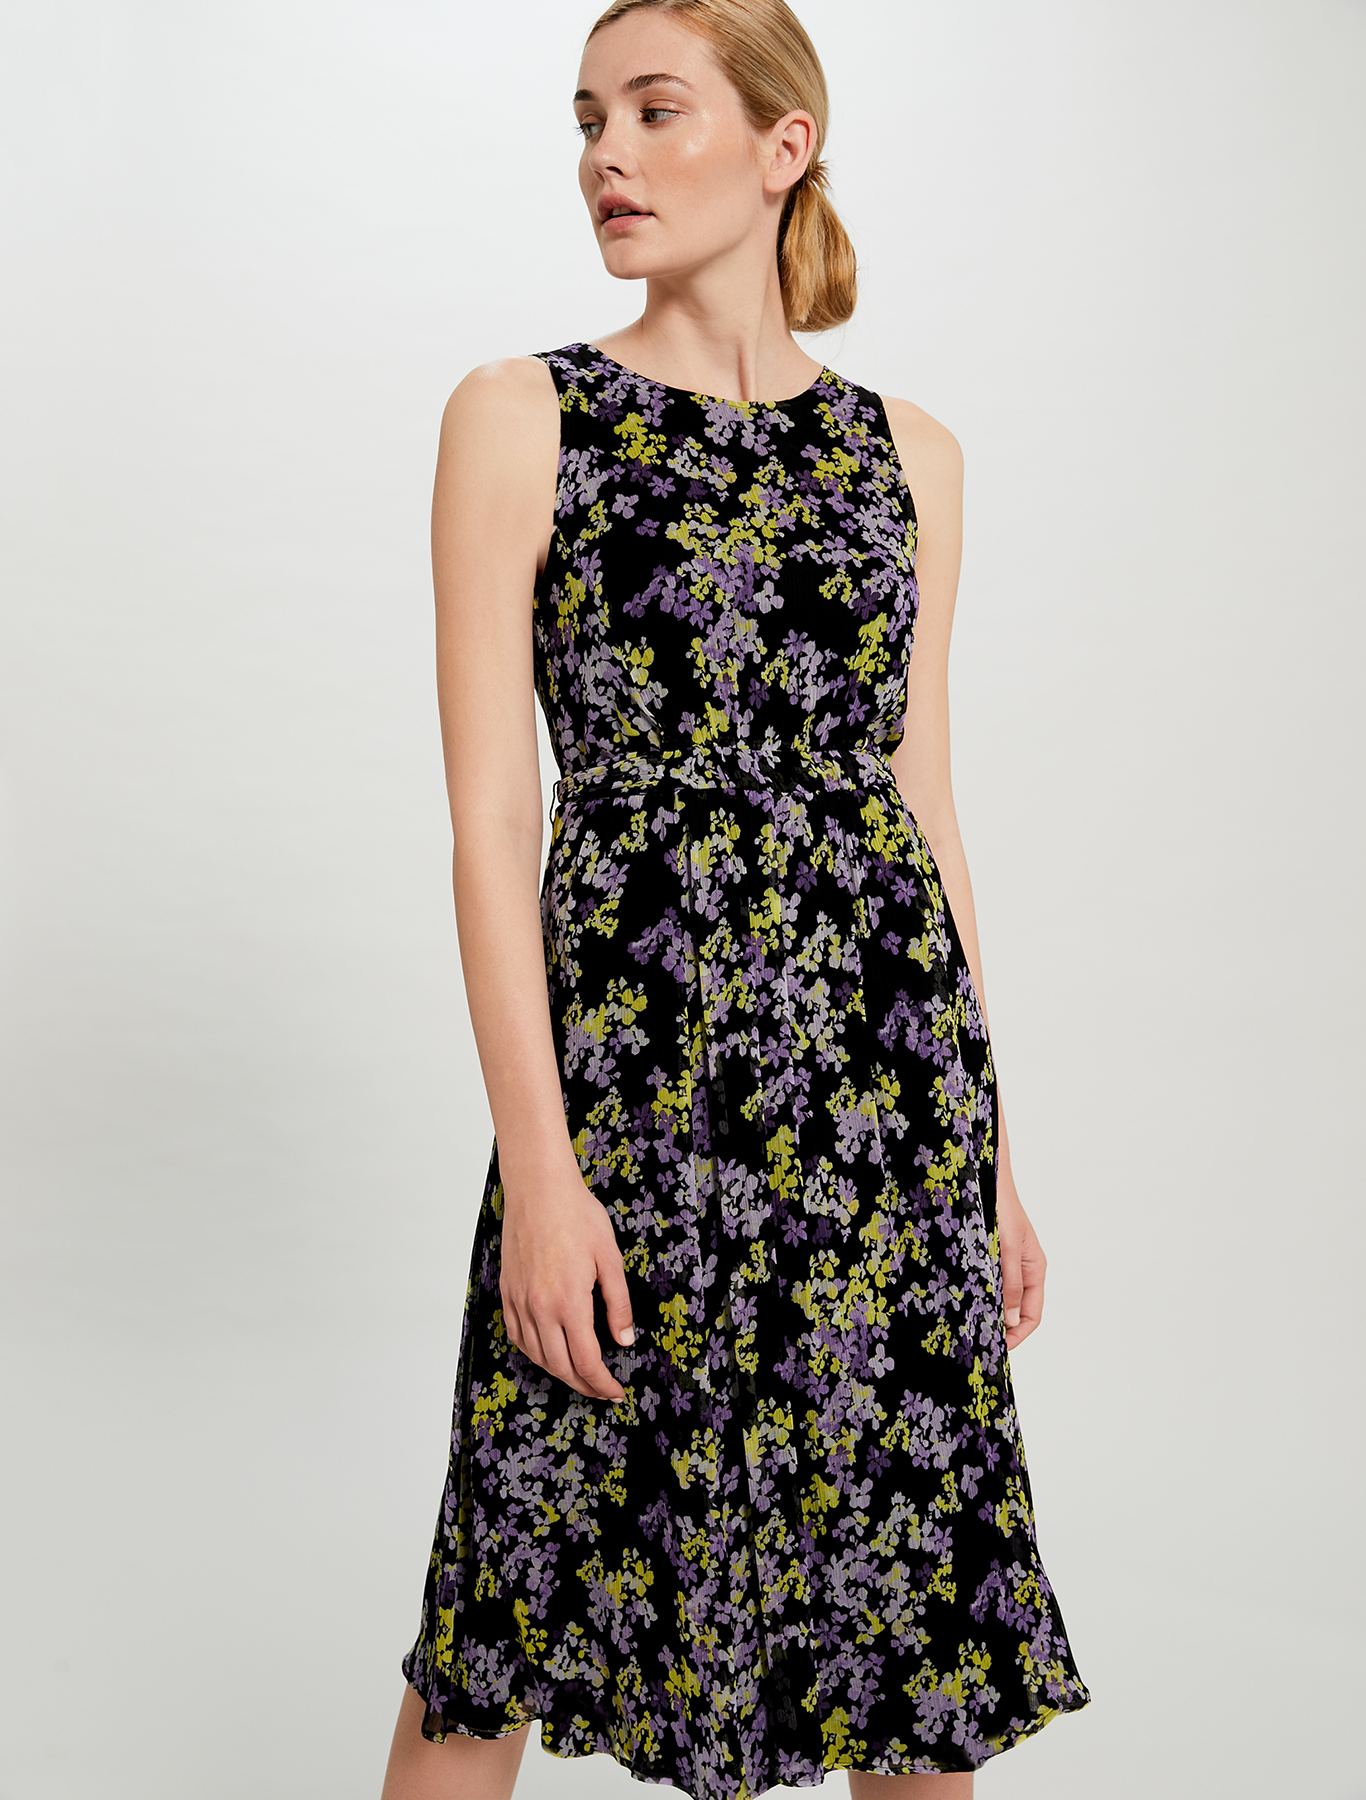 Floral dress with tie belt - black pattern - pennyblack